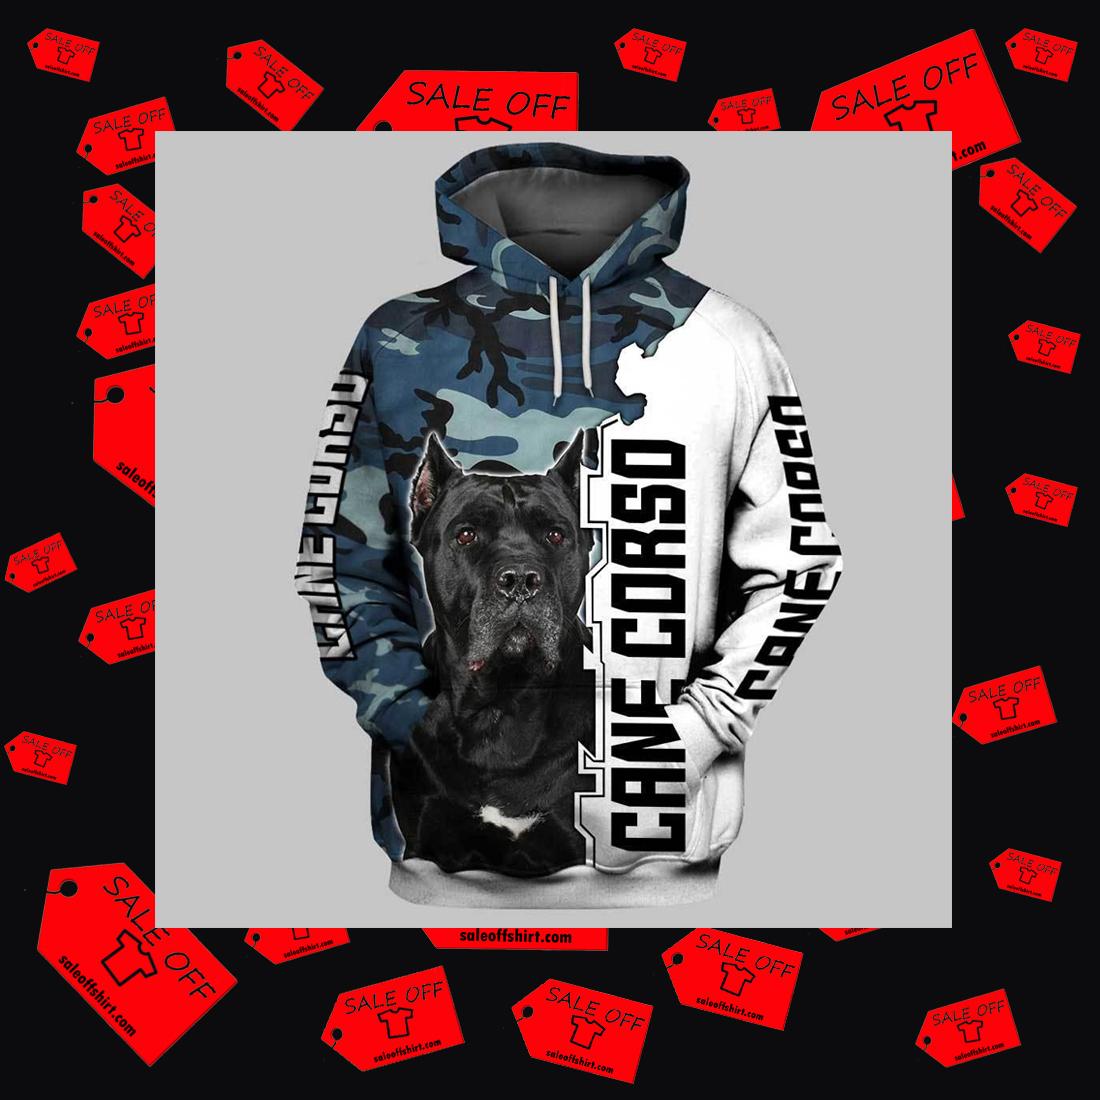 Cane Corso 3d full printing hoodie